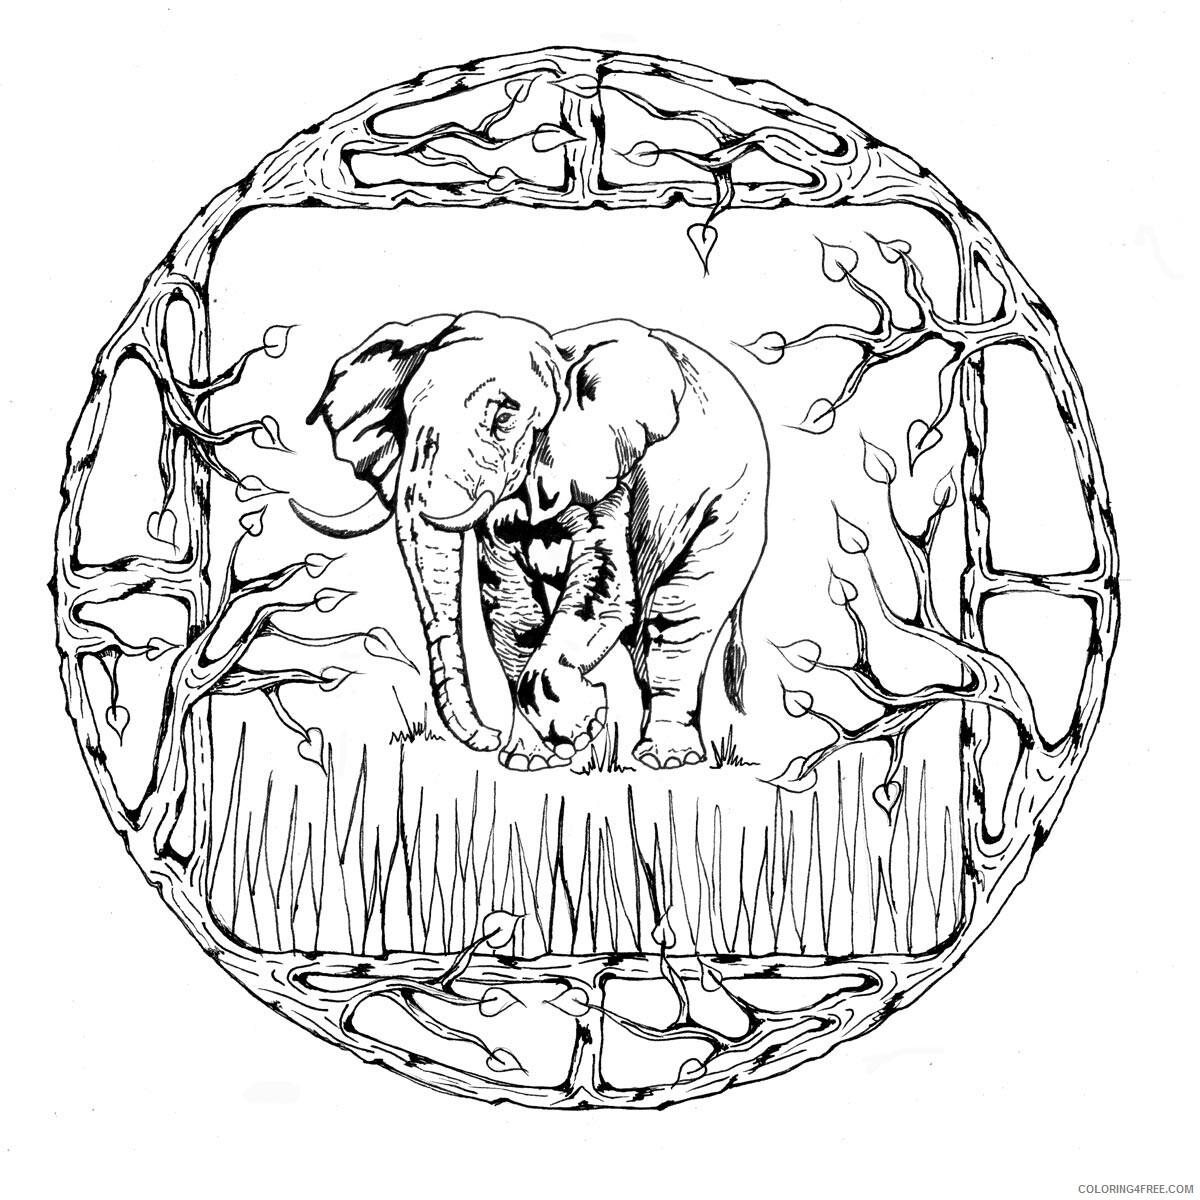 Mandala Coloring Pages Adult Elephant Mandala for Adults Printable 2020 529 Coloring4free